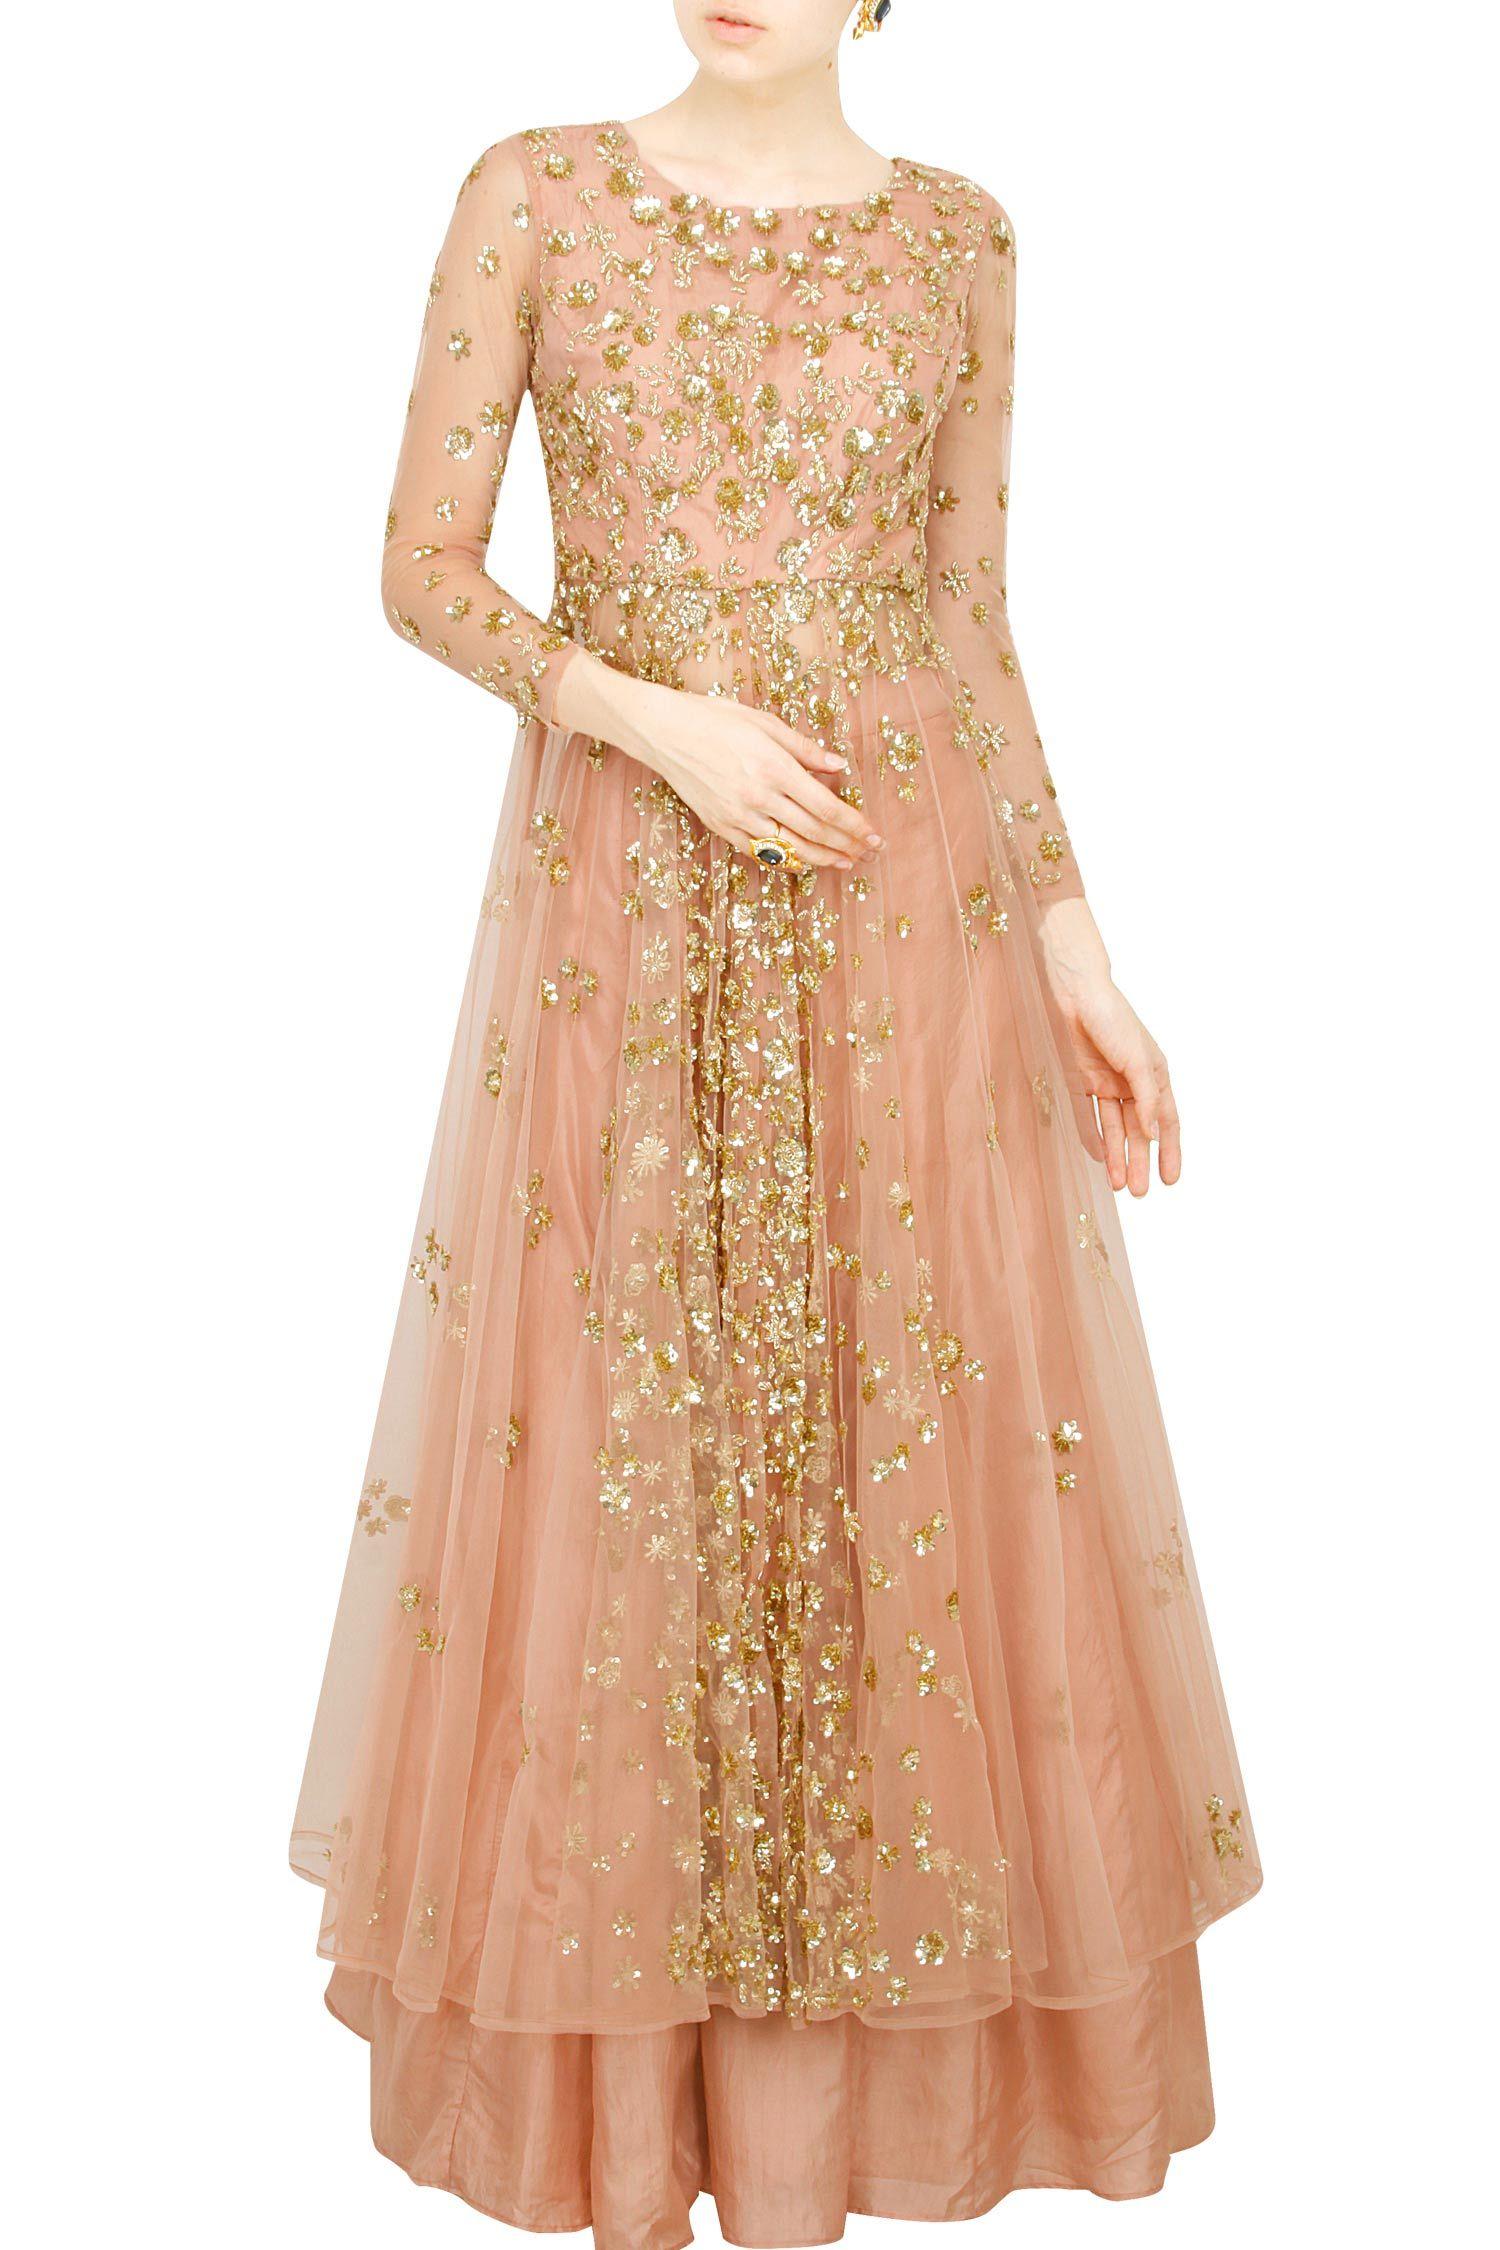 fc77fc88f54 Astha Narang presents Pink gold flare jacket with skirt